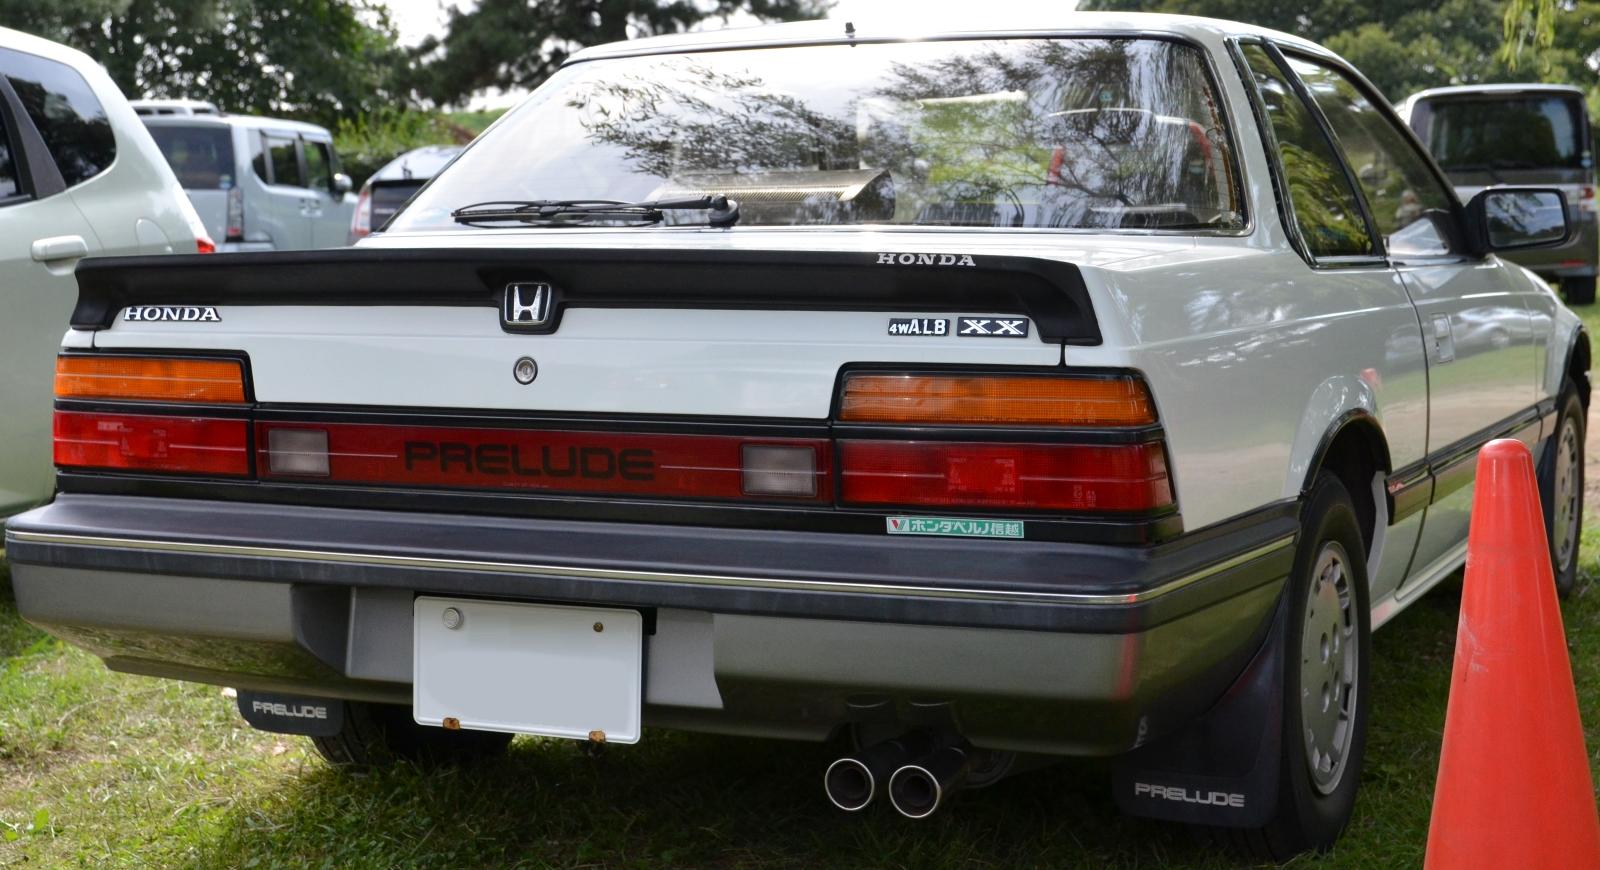 Honda Prelude 2017 >> File Honda Prelude Xx Ab Rear Jpg Wikimedia Commons